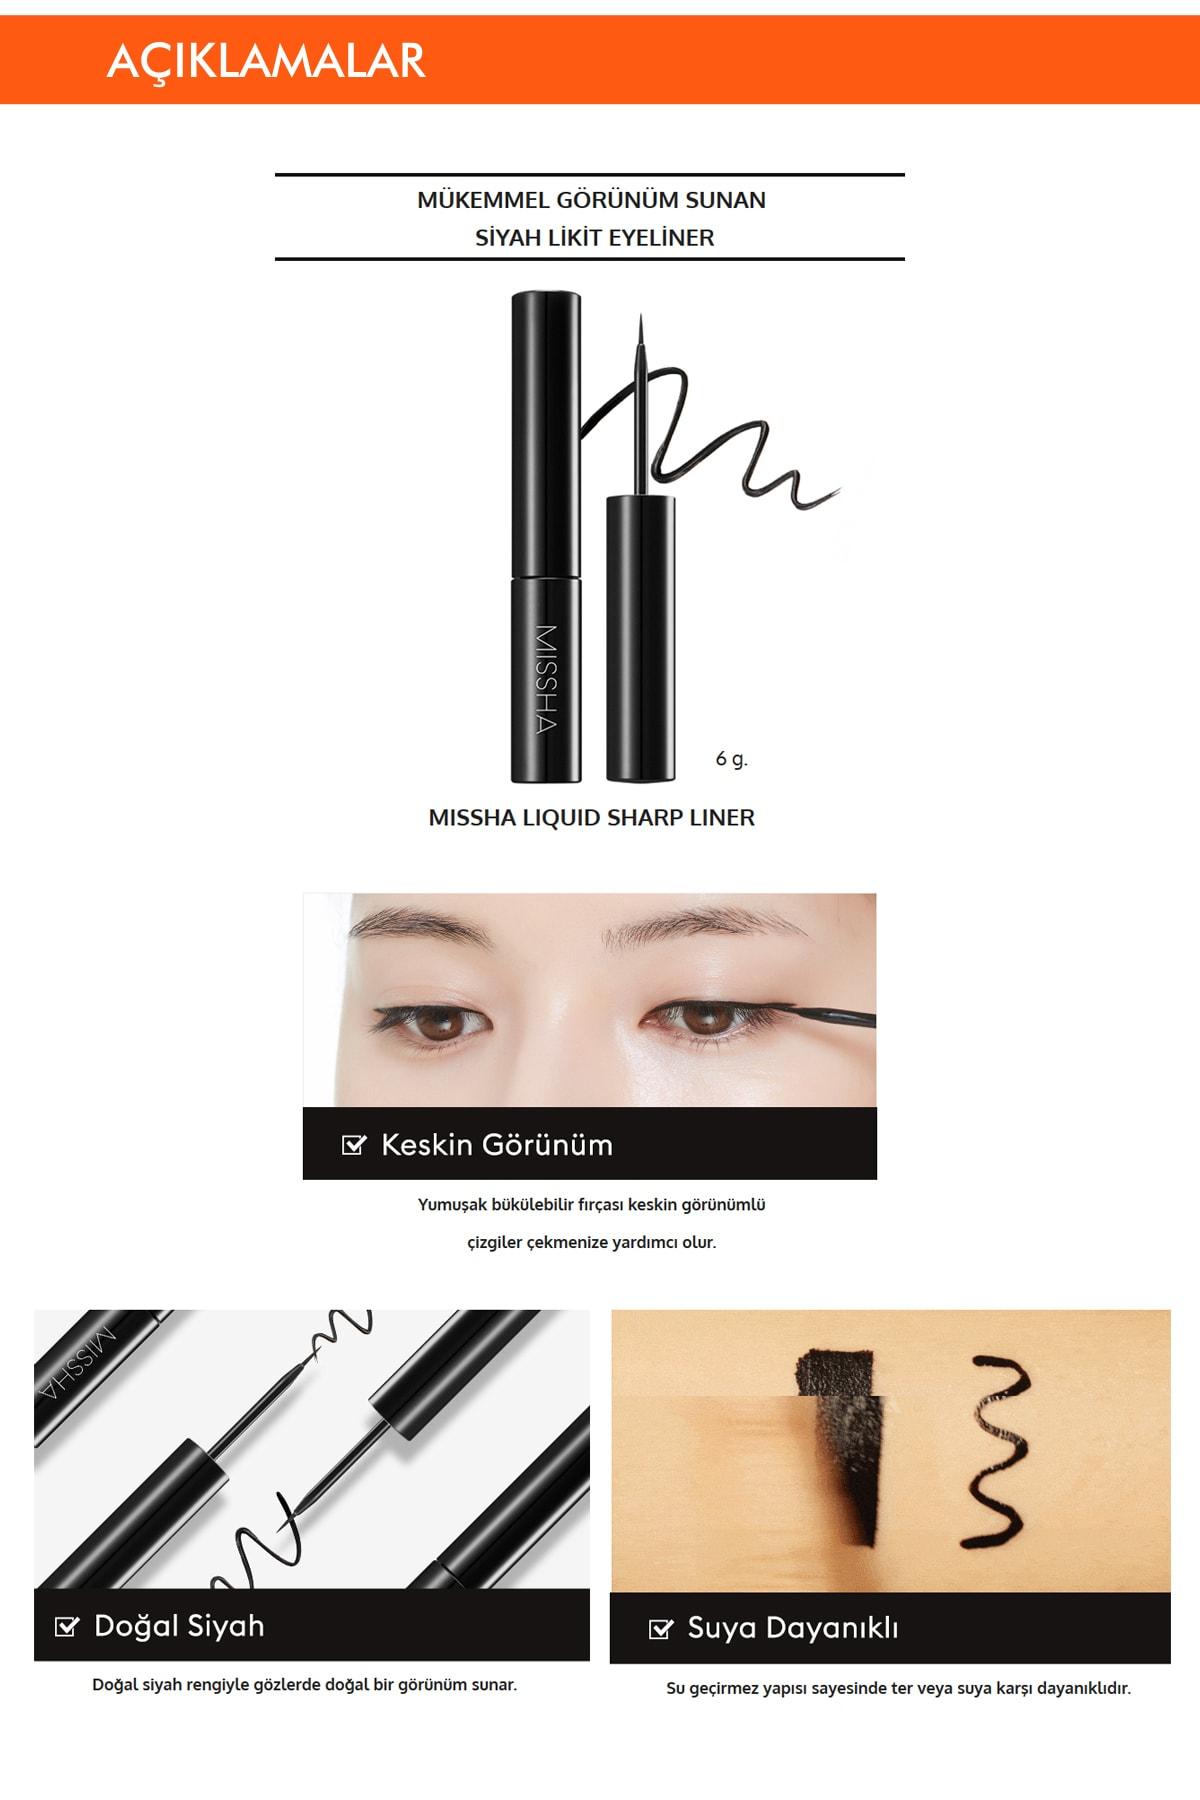 Missha Suya Dayanıklı Likit Eyeliner Liquid Sharp Liner 2